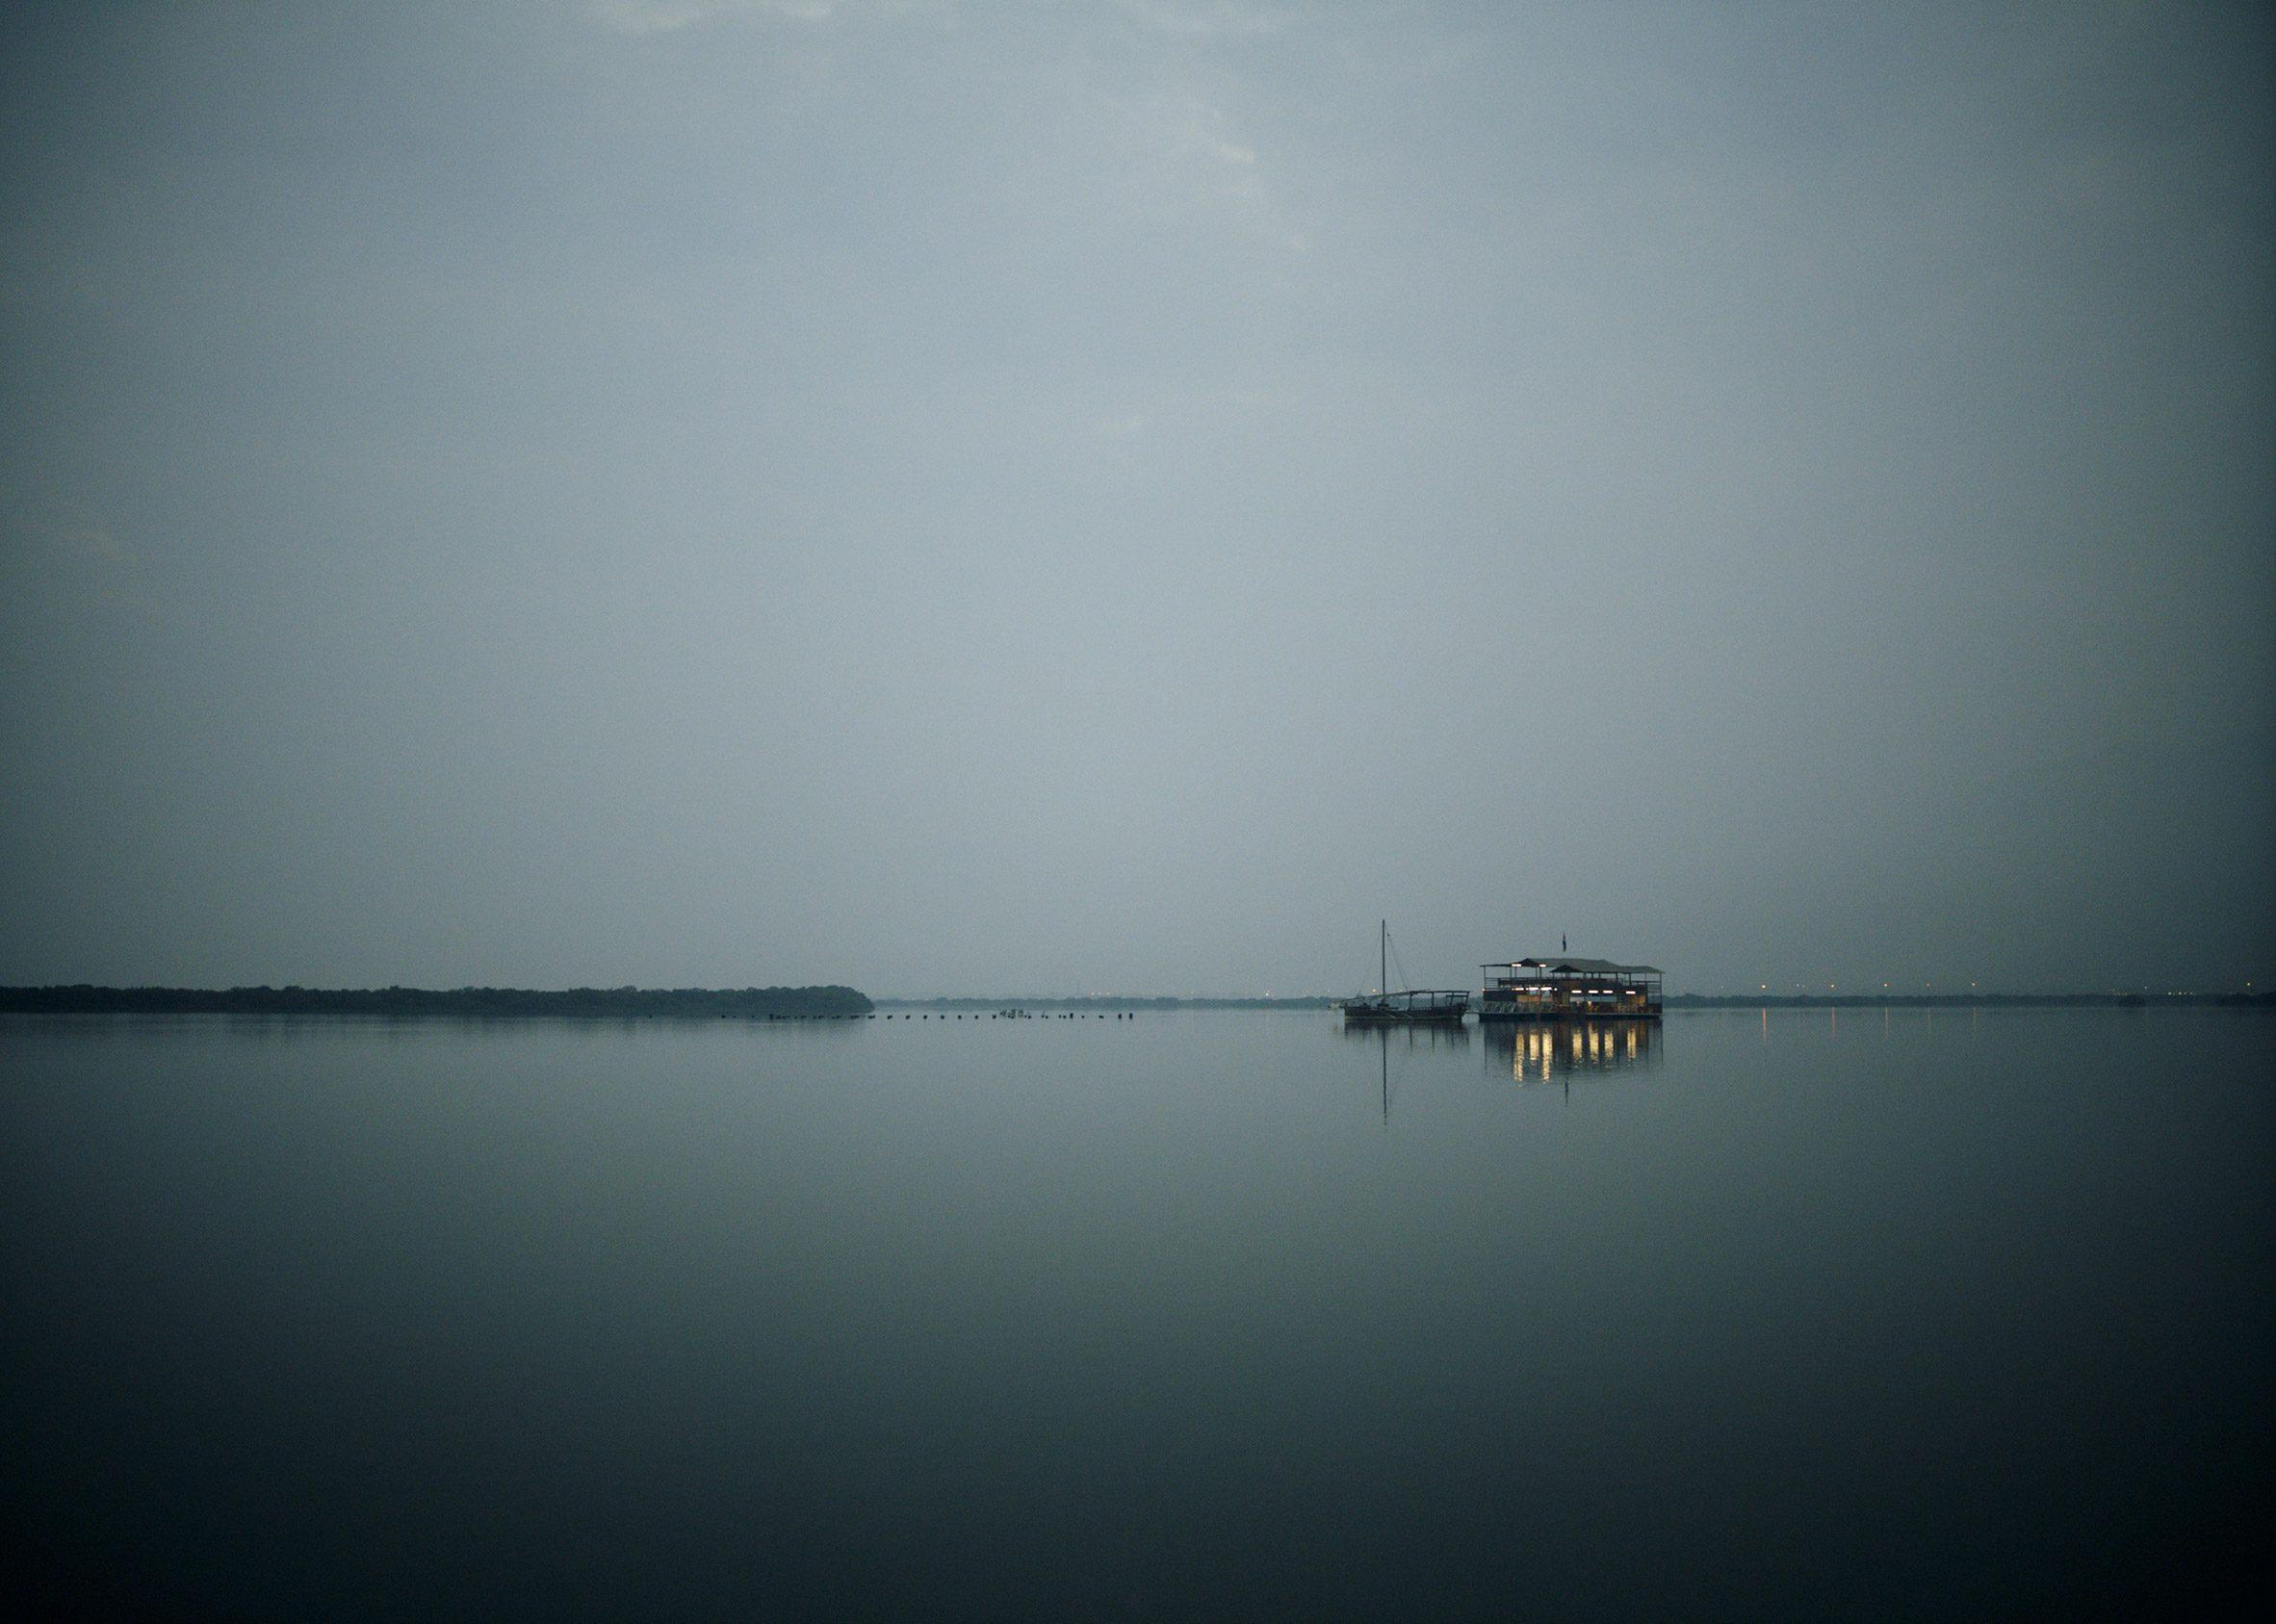 A photograph of the Dubai sea